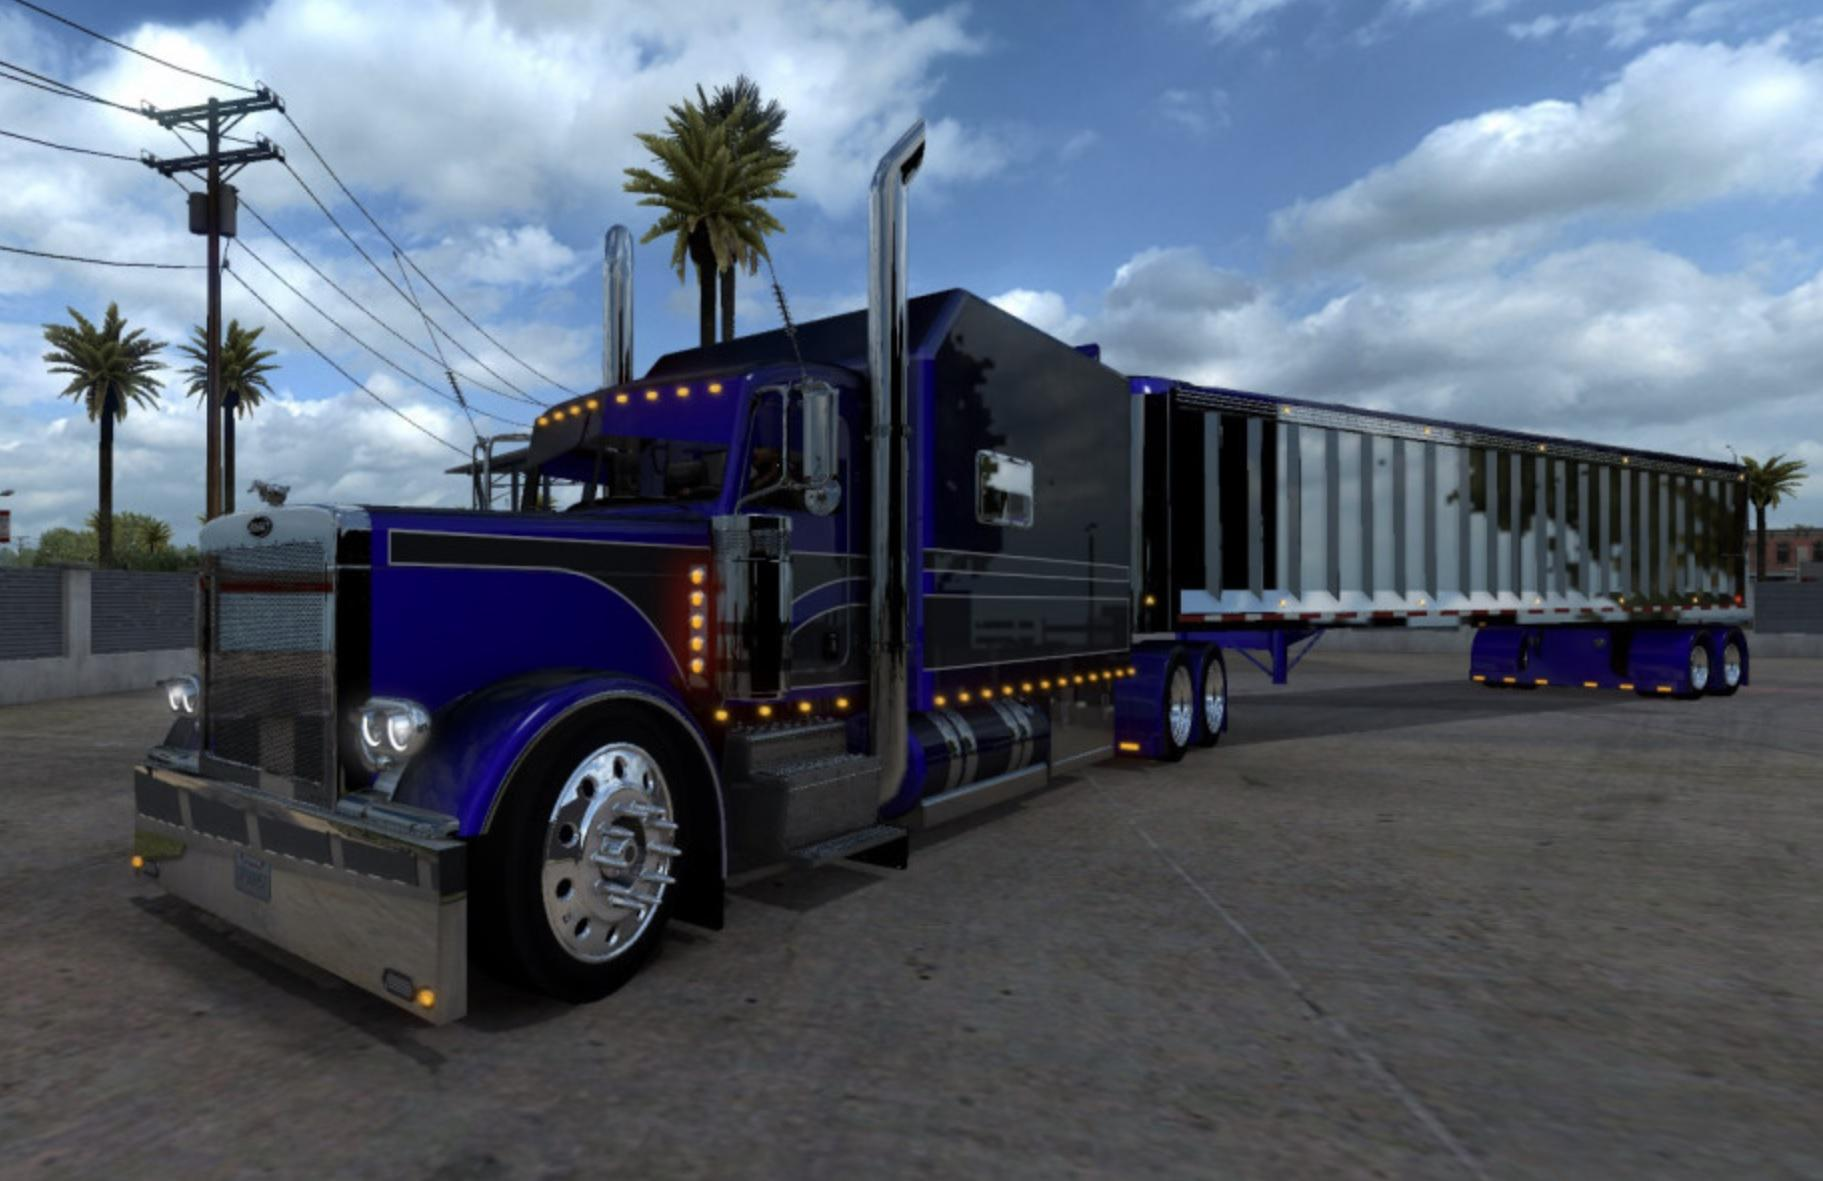 Ats Outlaw Peterbilt 379 Truck V3 3 1 38 X American Truck Simulator Mods Club